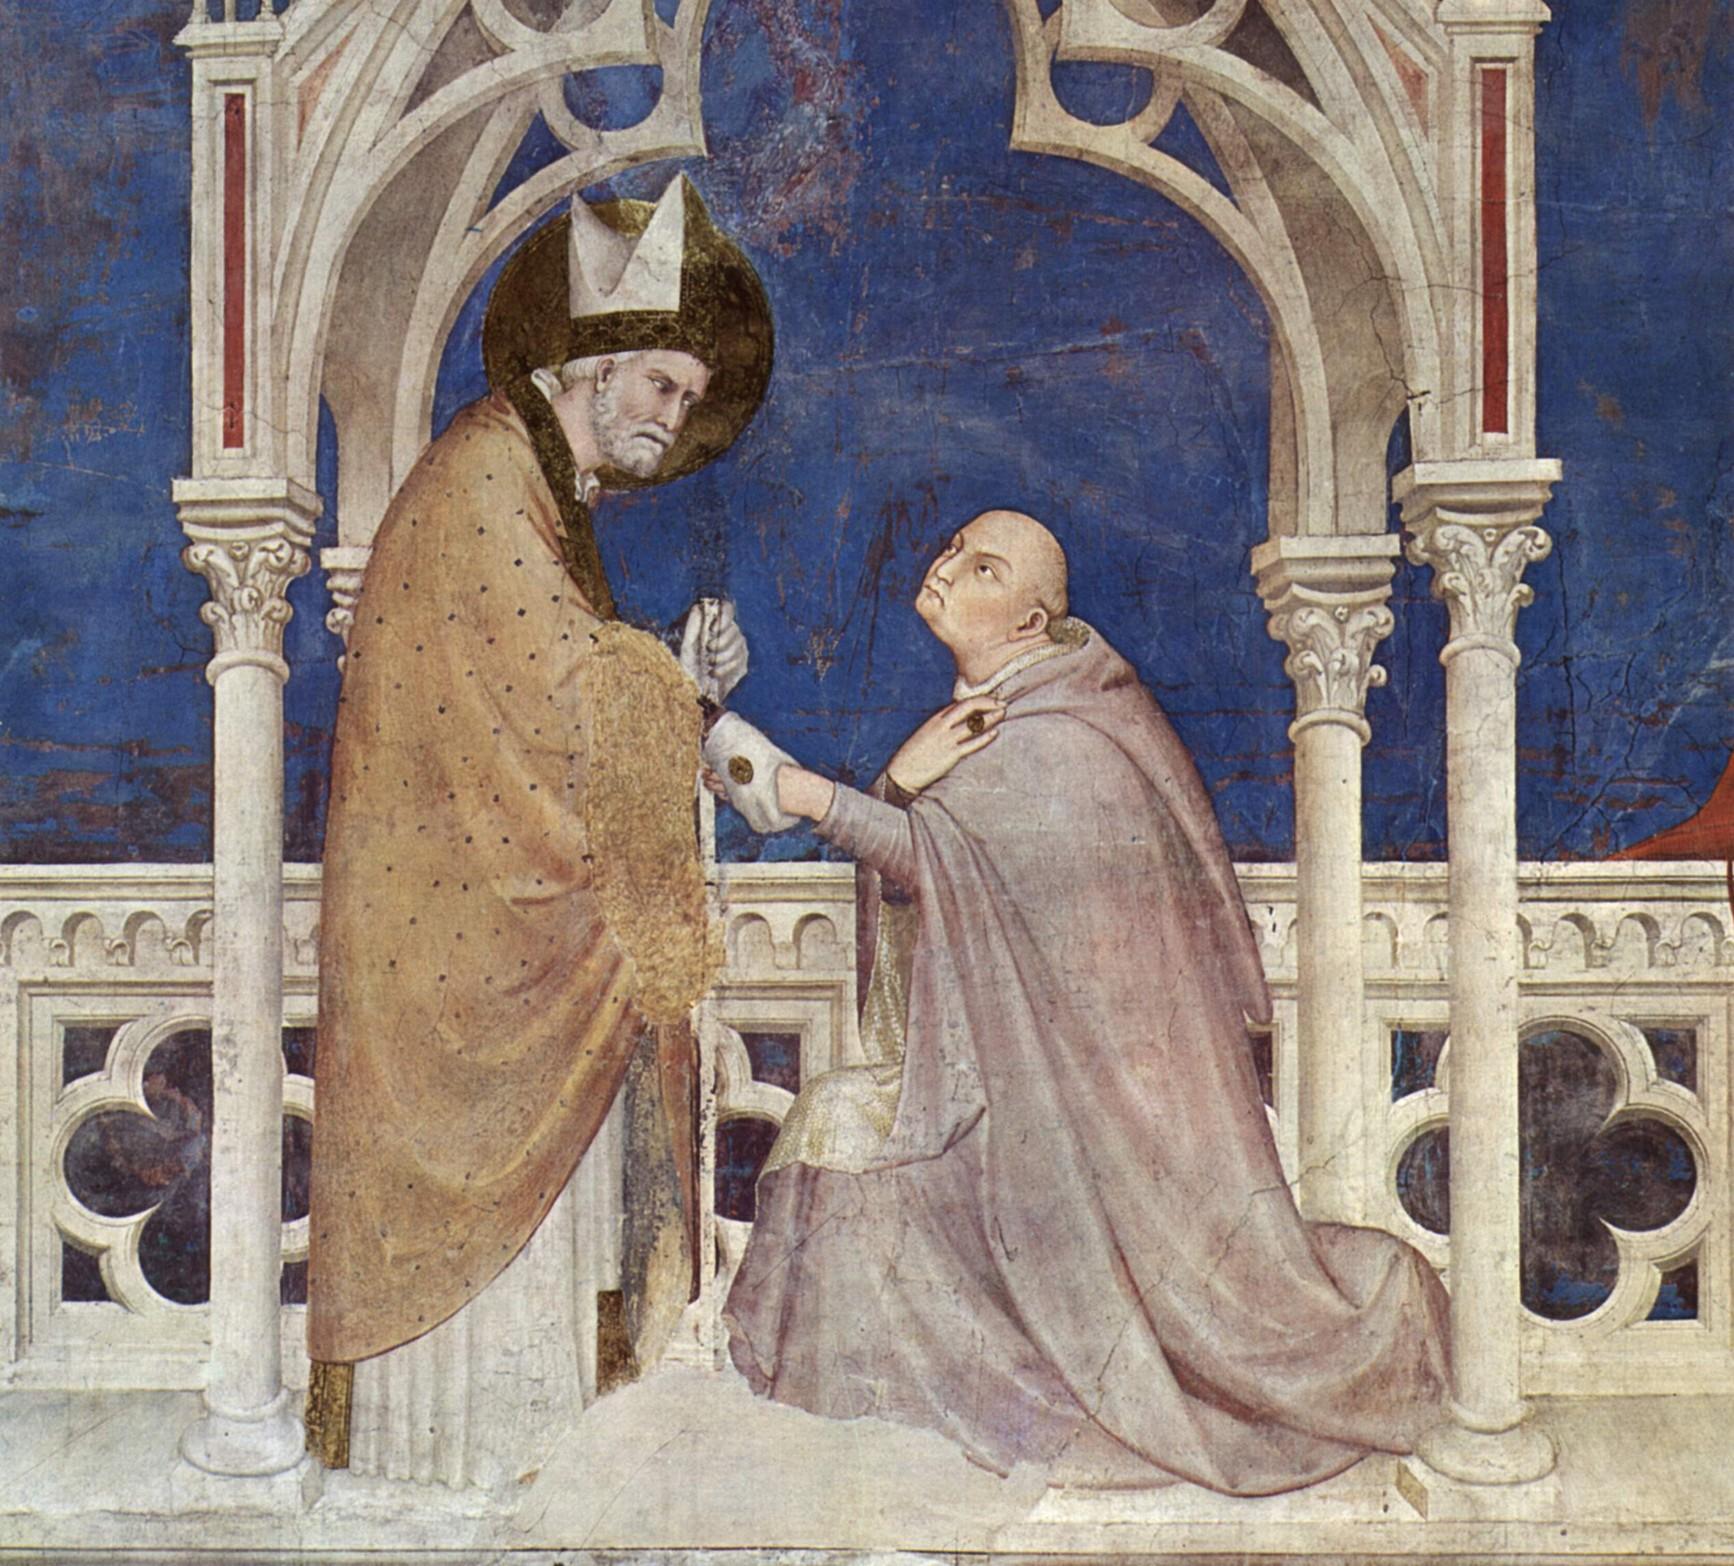 simone_martini_23_dedication_of_the_chapel_to_st_martin_by_the_cardinal_gentile_da_montefiore